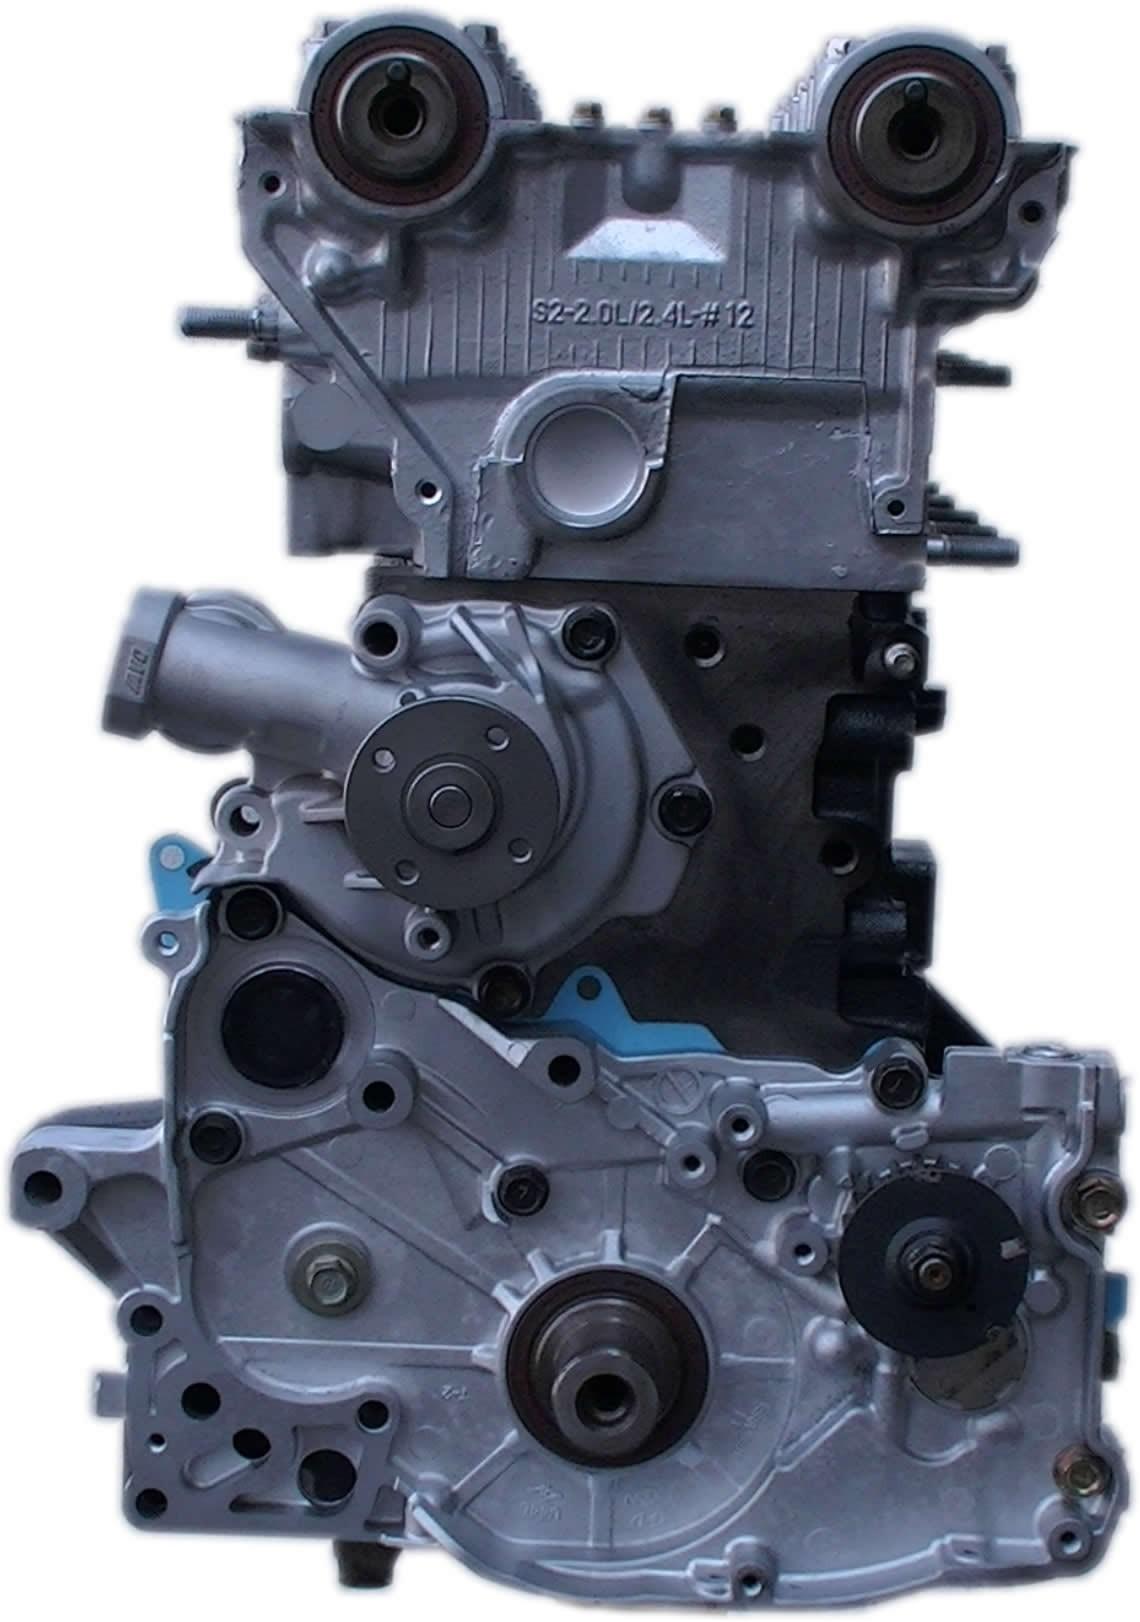 Rebuilt 01-06 Kia Optima 4cyl 2.4L DOHC Engine « Kar King Auto